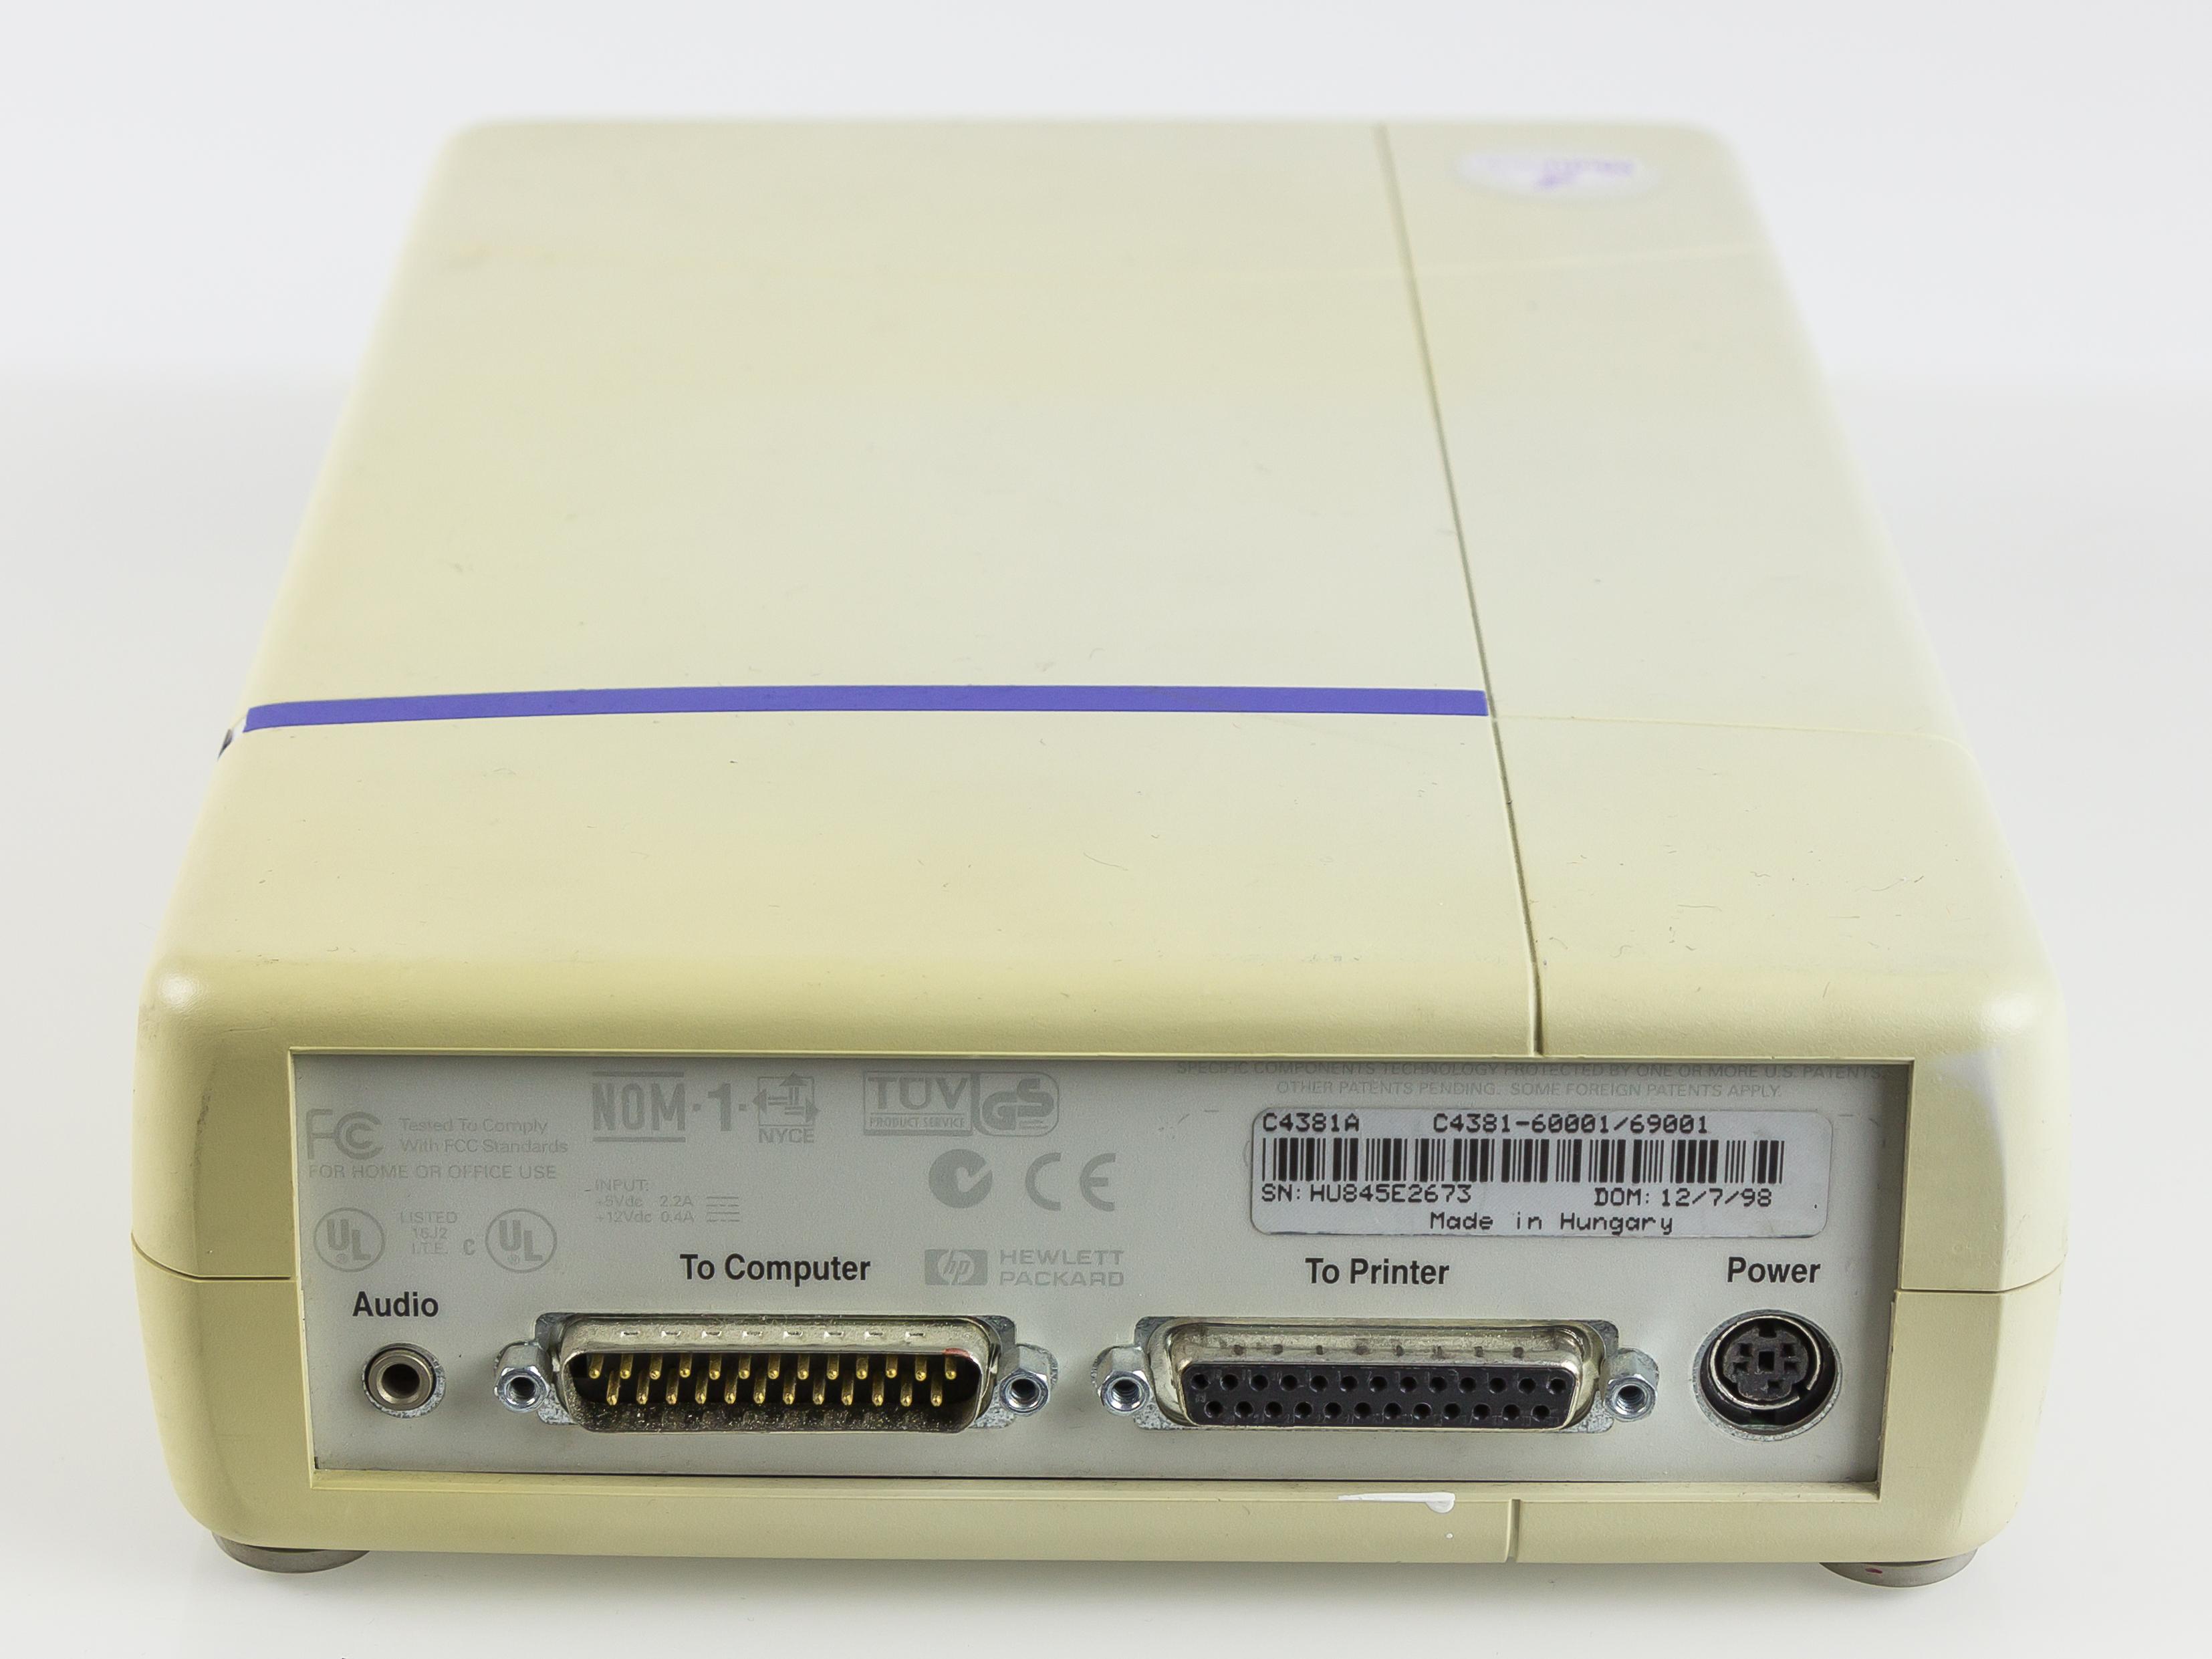 HP USB CD-Writer cd4e - drivers for windows 7 FOUND